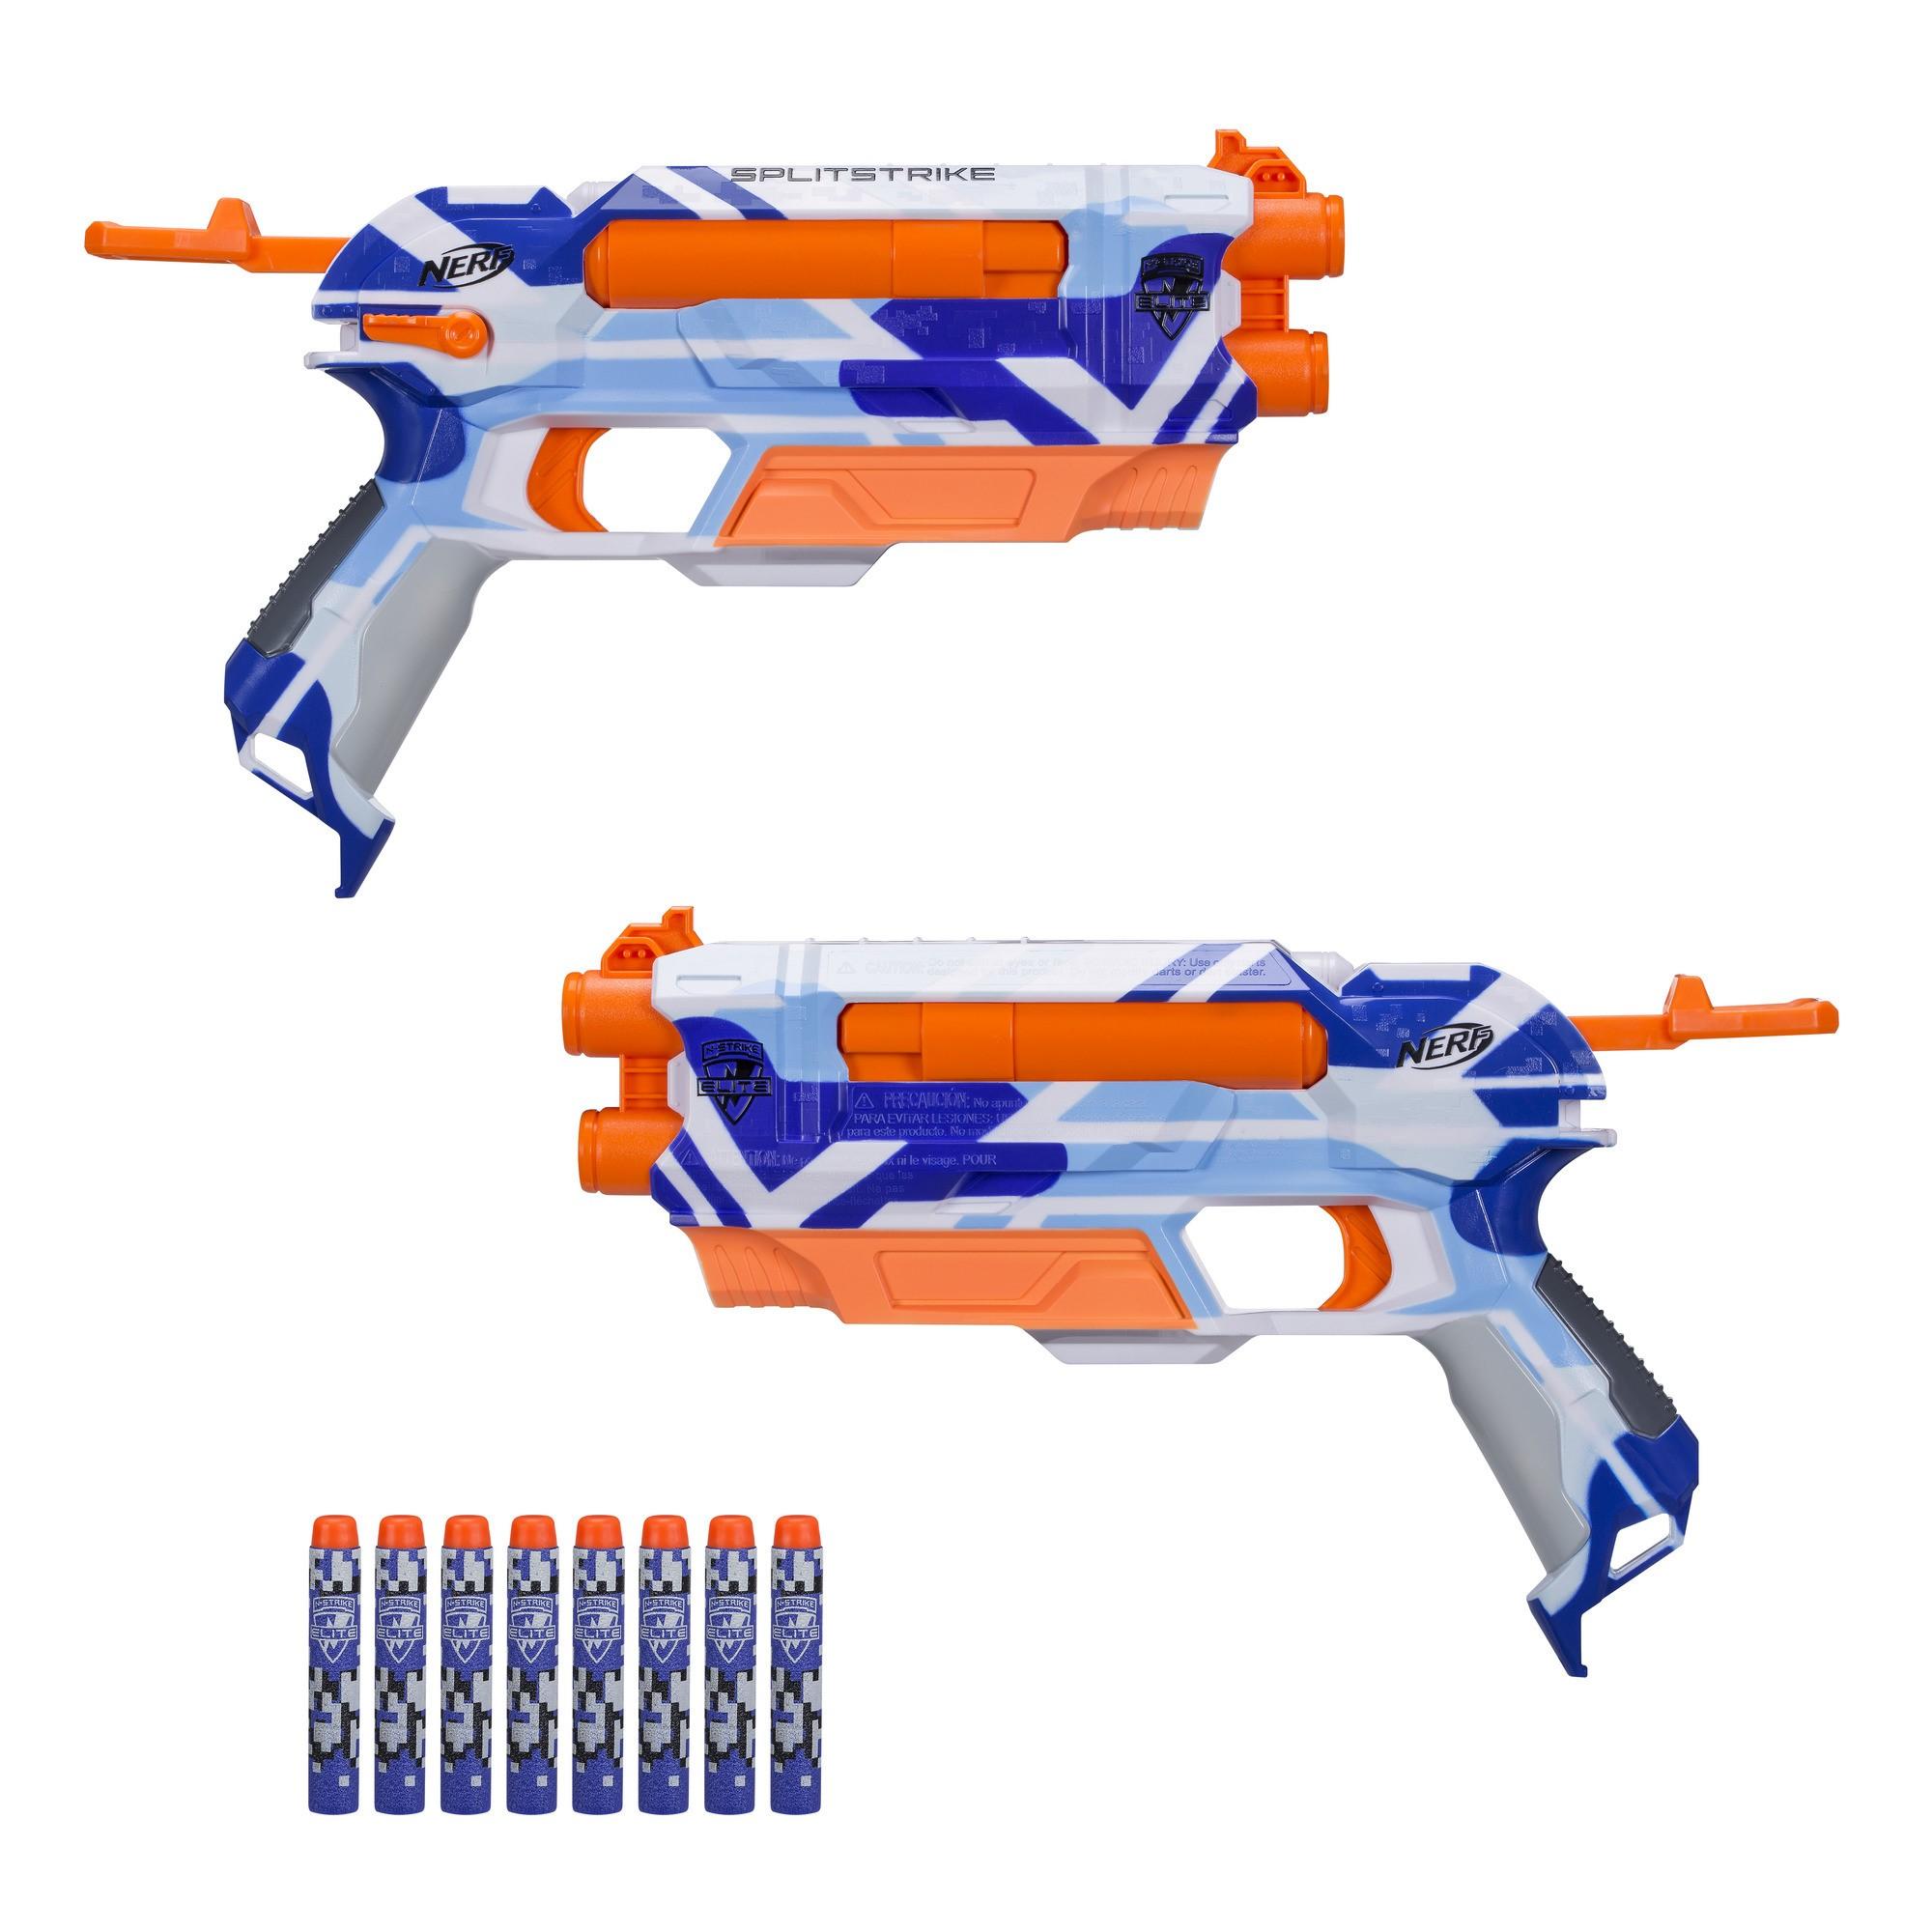 Nerf N-strike Elite Splitstrike